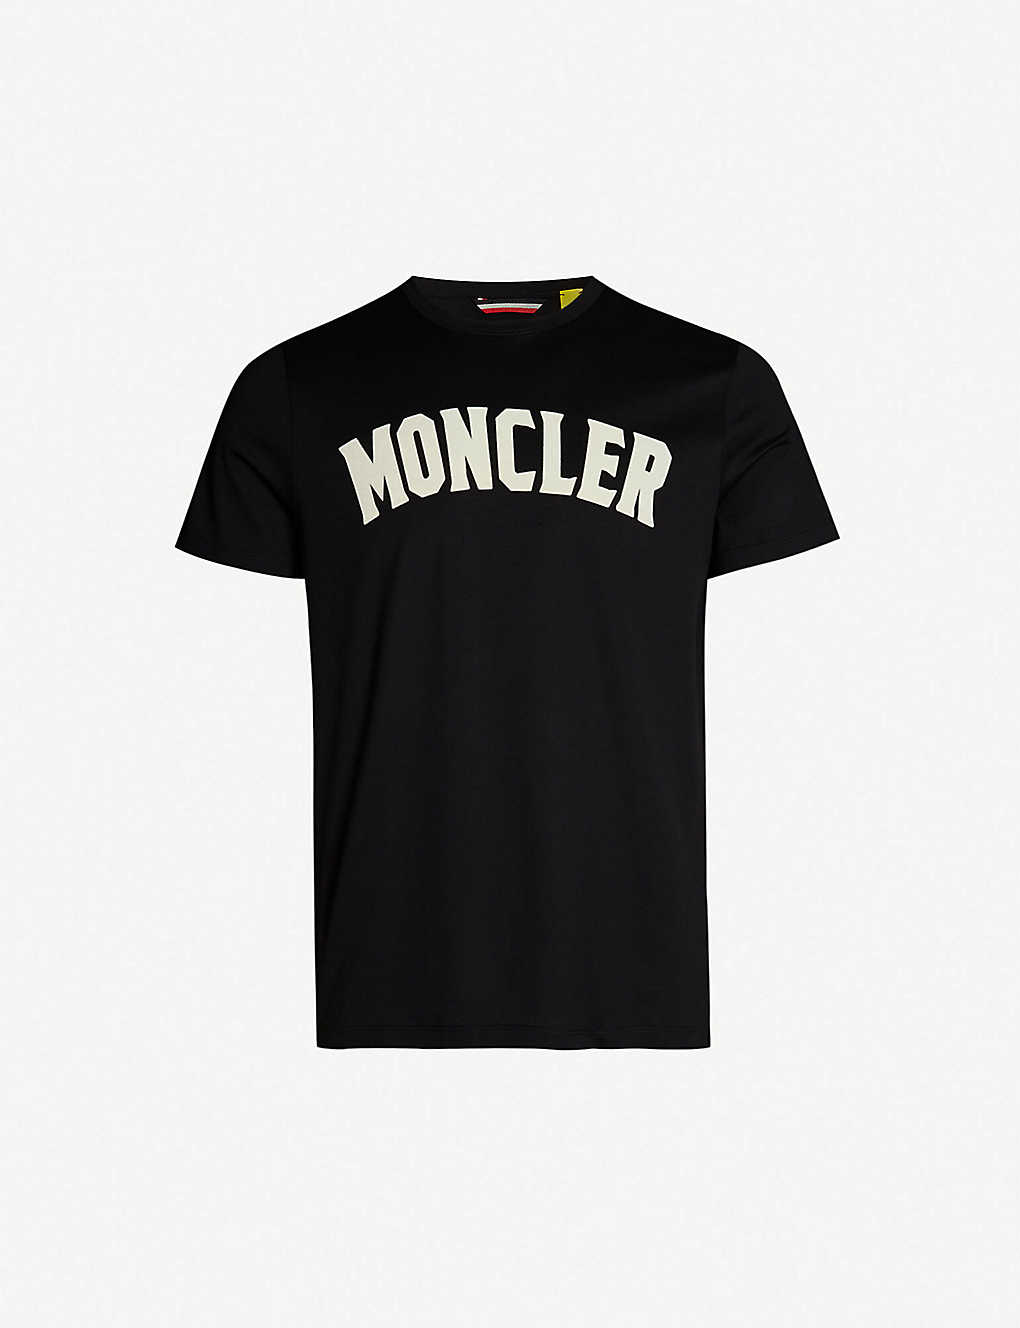 316d11d6 MONCLER GENIUS - Moncler 2 1952 logo-print cotton-jersey T-shirt ...